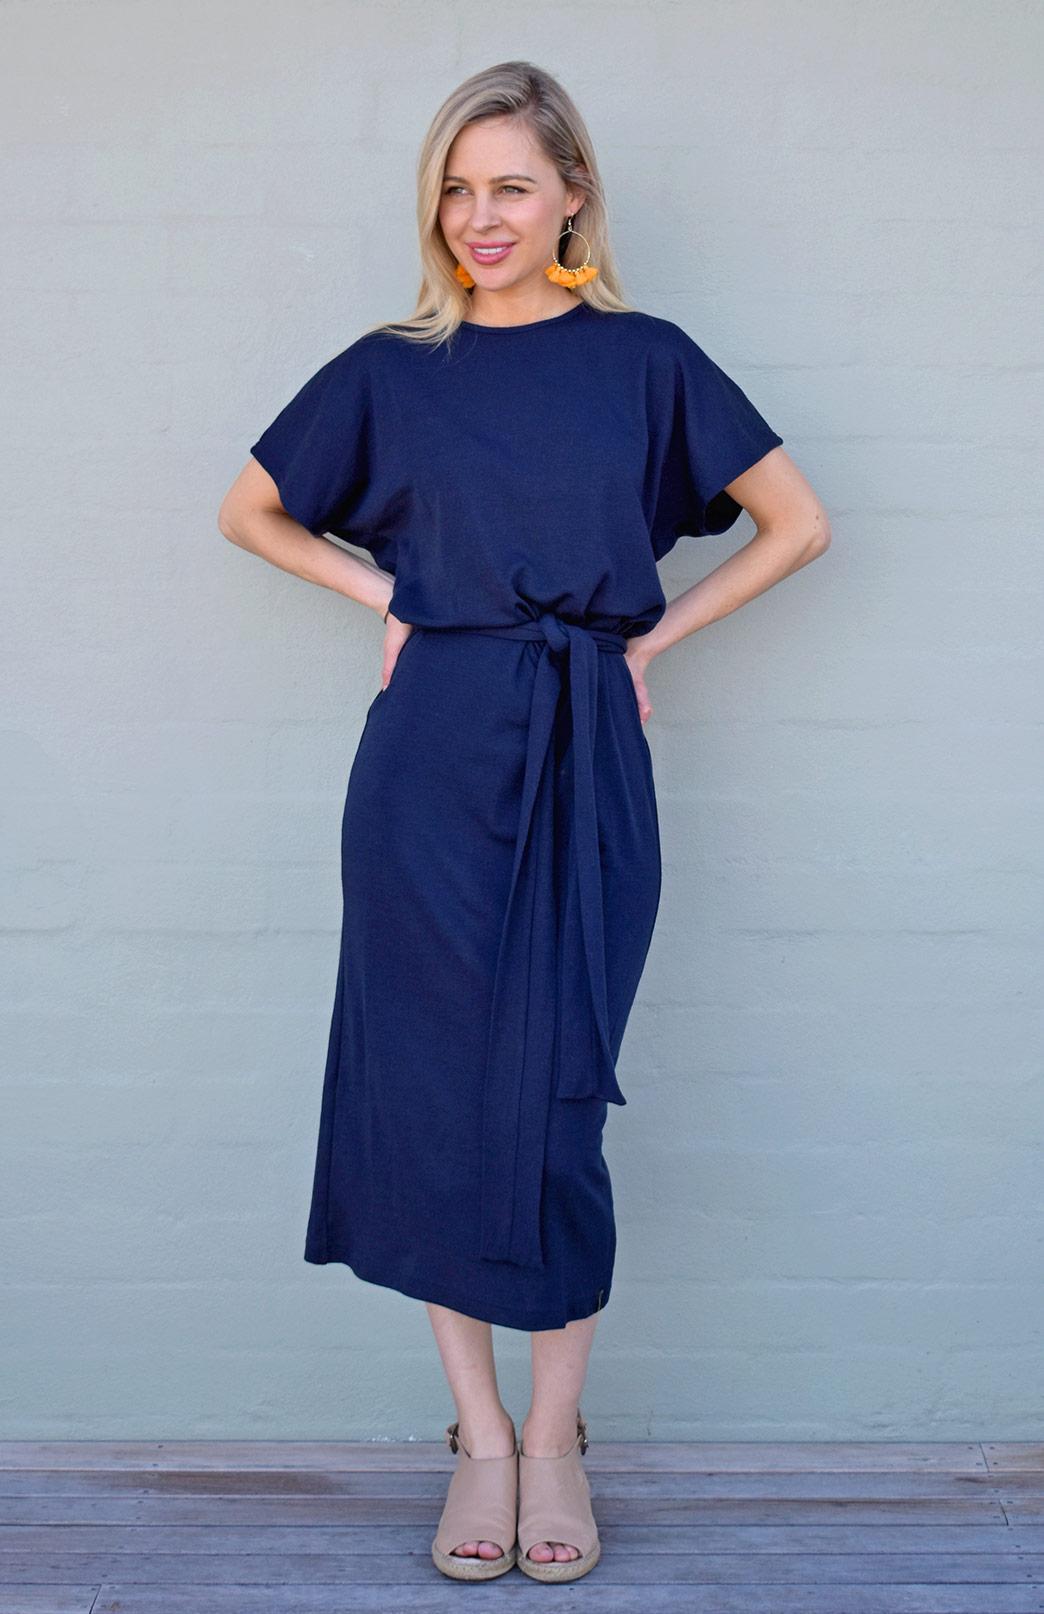 Margo Dress - Women's Knee Length Navy Blue Merino Wool Loose T-Shirt Dress with Sleeves and Waist Tie - Smitten Merino Tasmania Australia